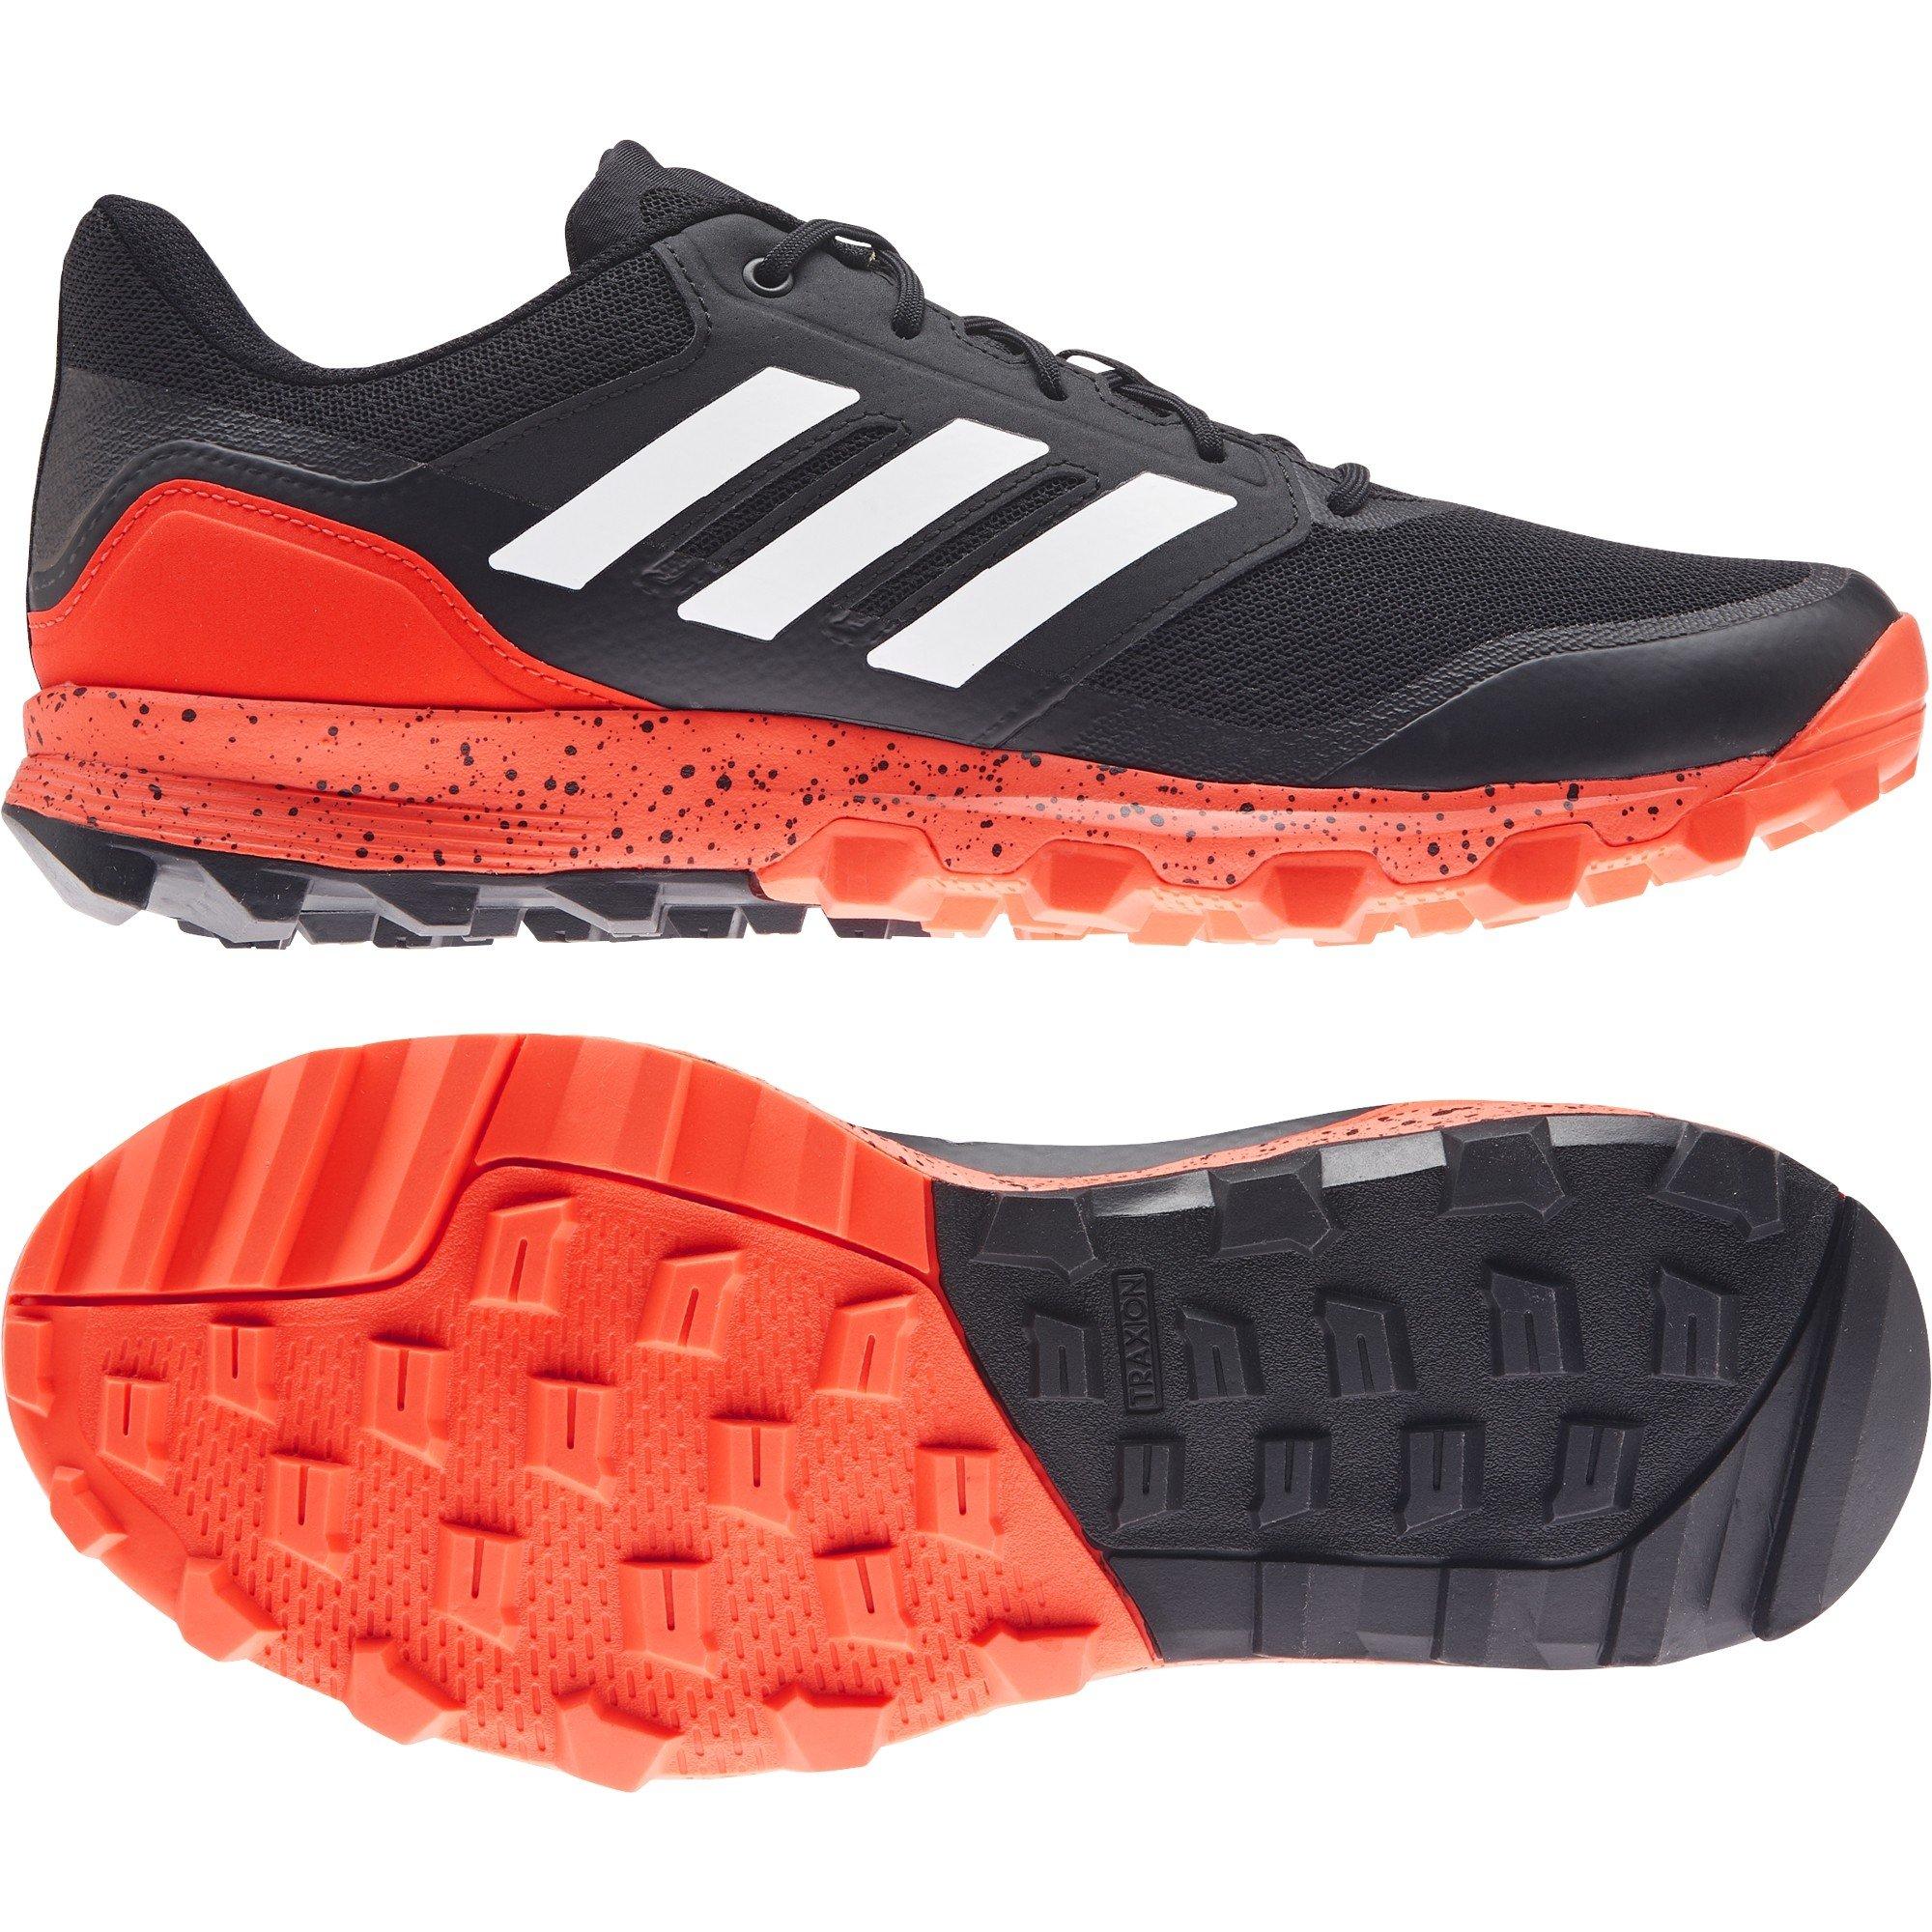 2021/22 Adidas Flexcloud 2.1 Hockey Shoes - Black/Orange